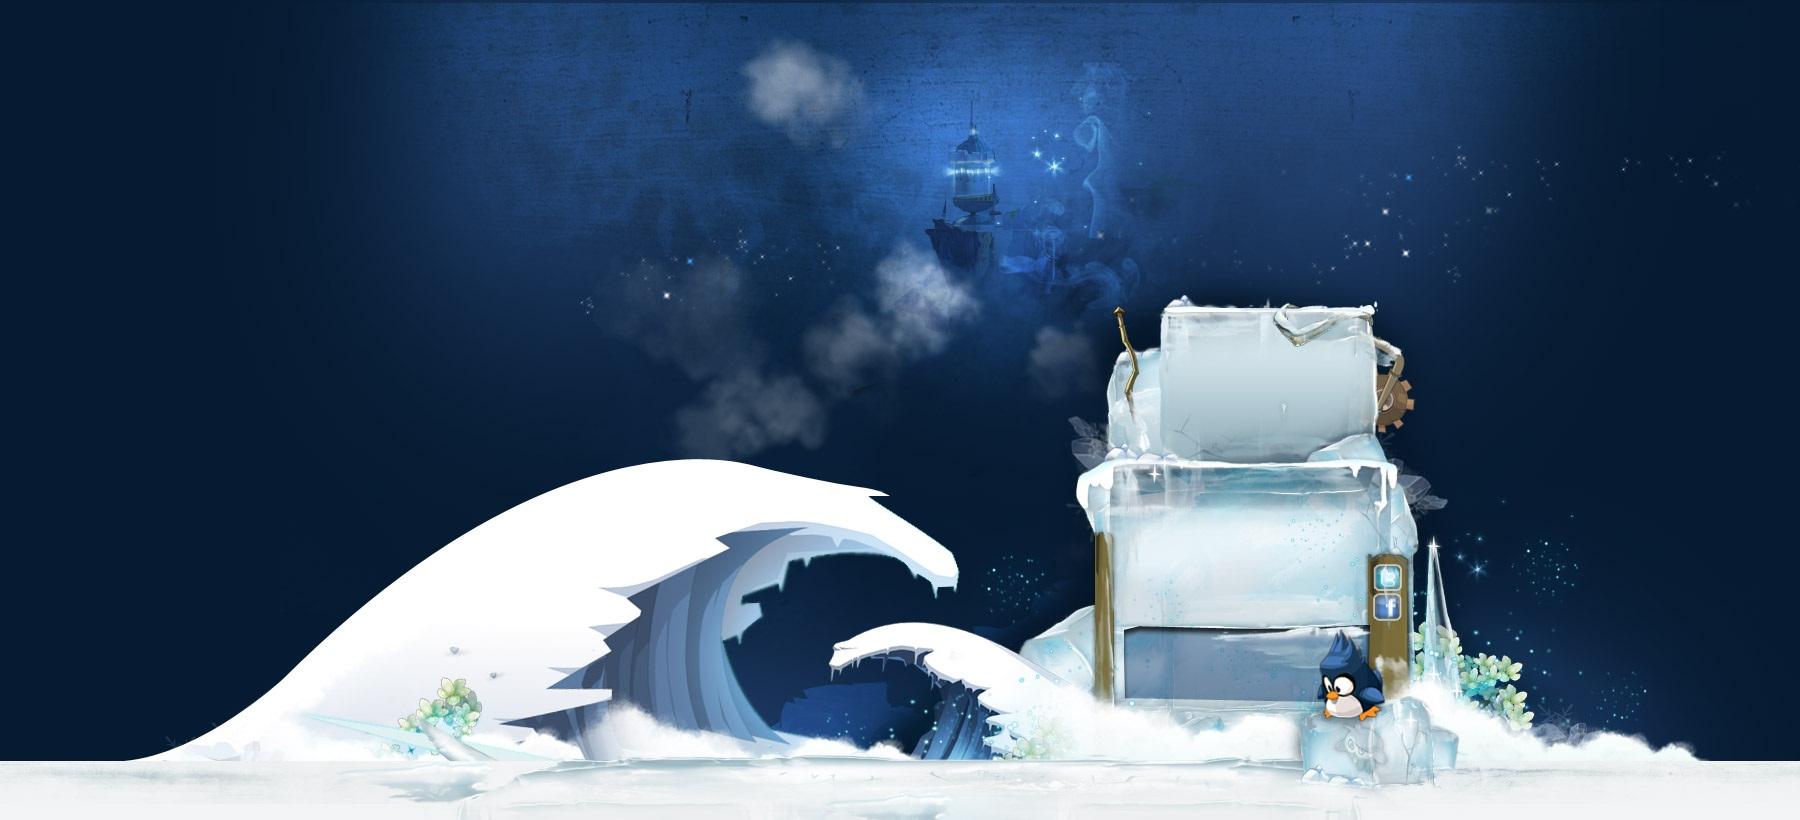 Snow Anime Wallpaper Dofus 707666 Zerochan